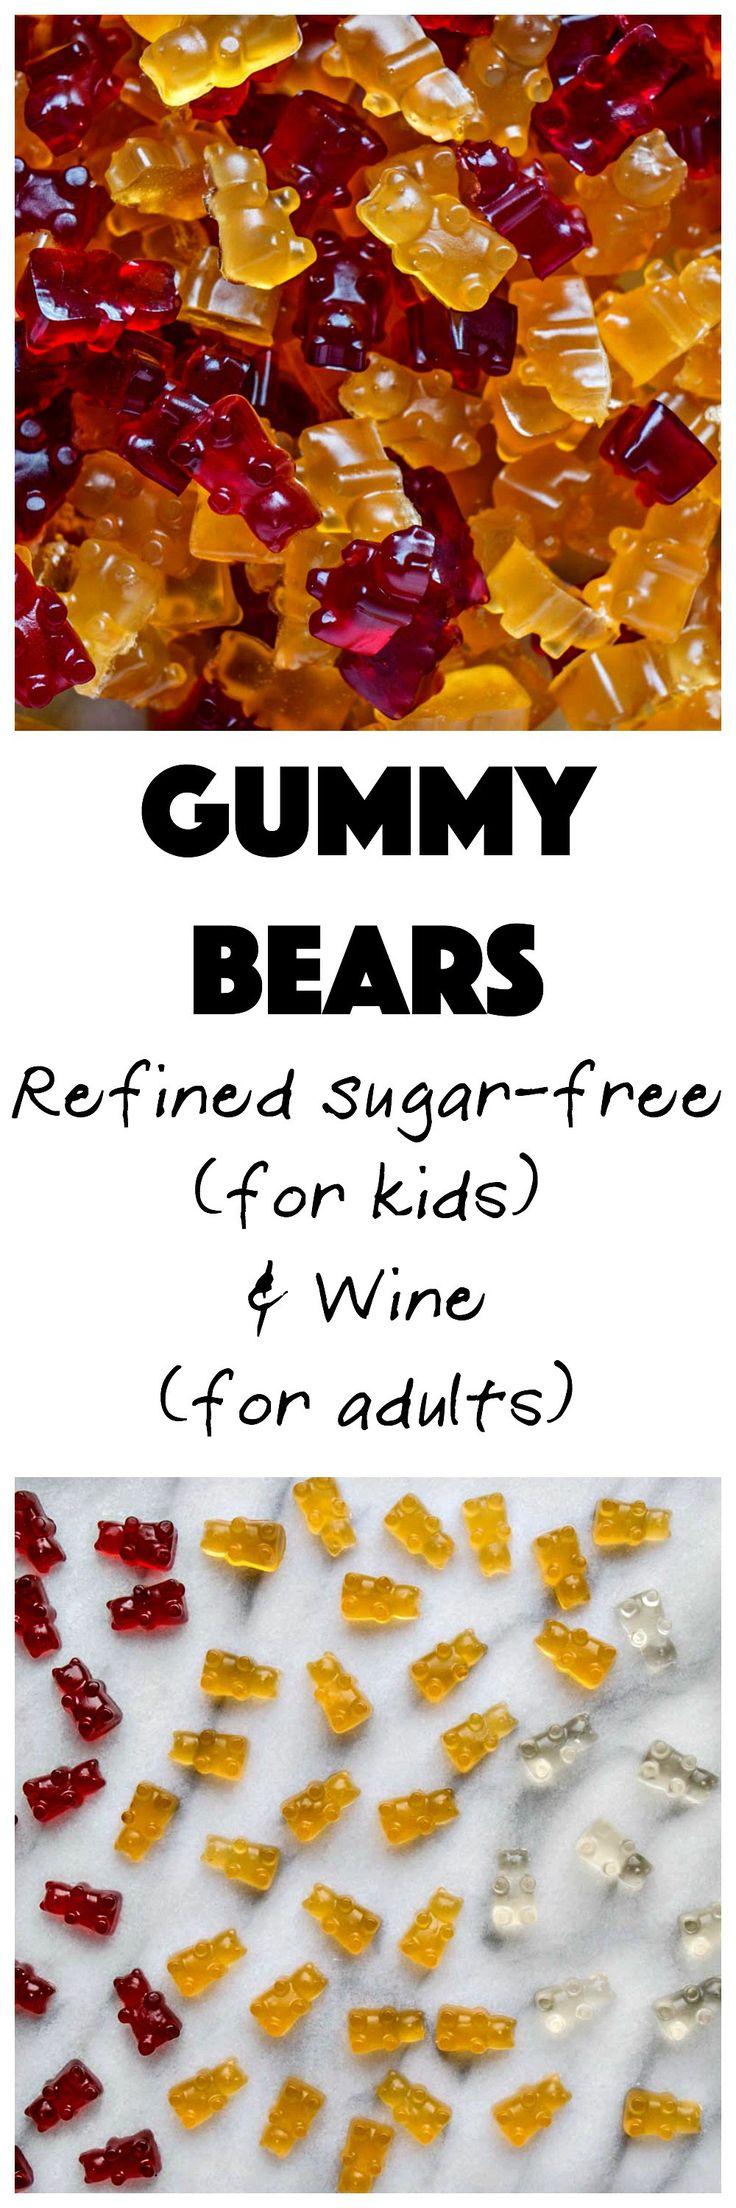 Gummy Bears   My Kitchen Love. Kid-loving, refined sugar-free treat! #candy #gummybears #sugarfree